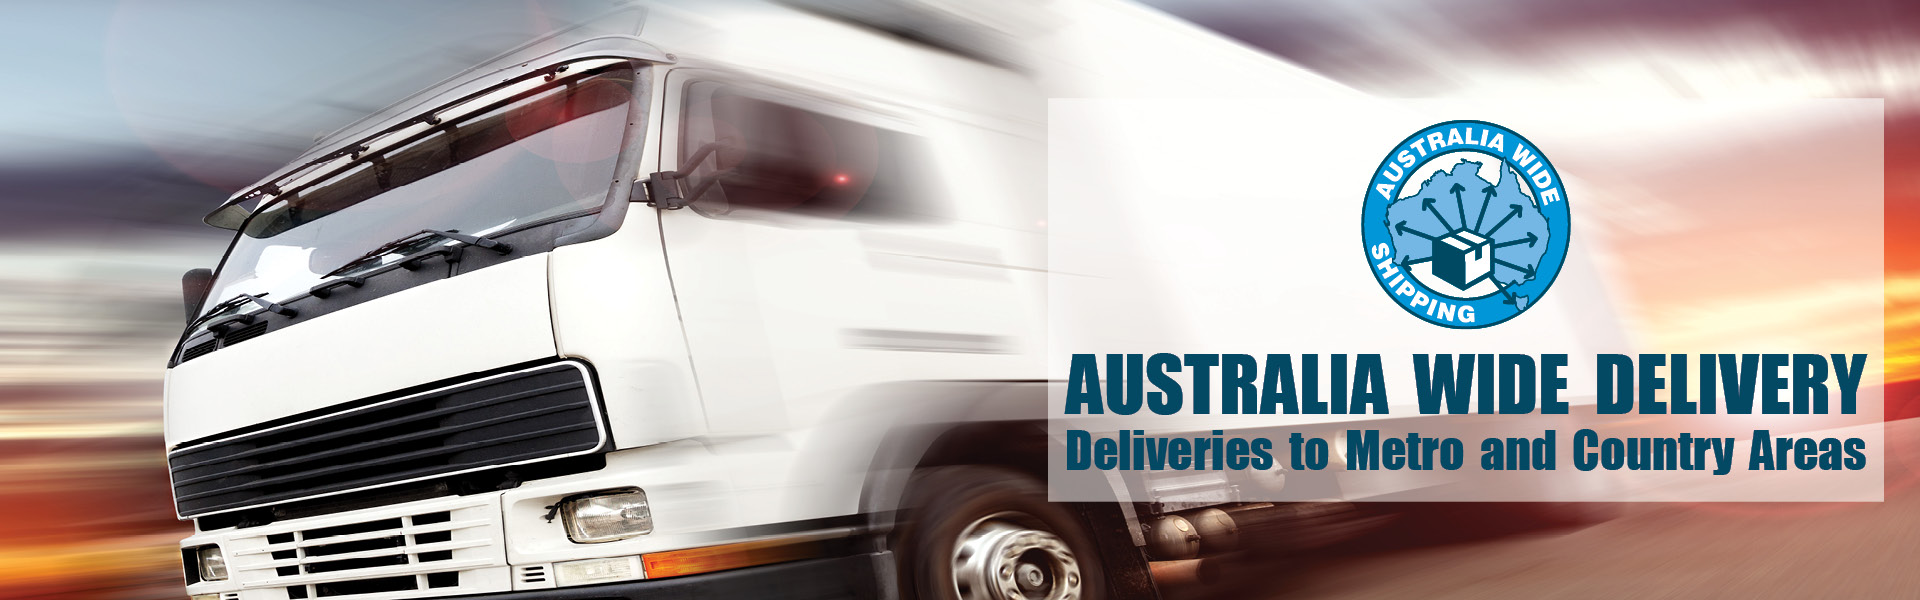 Australian Wide Delivery